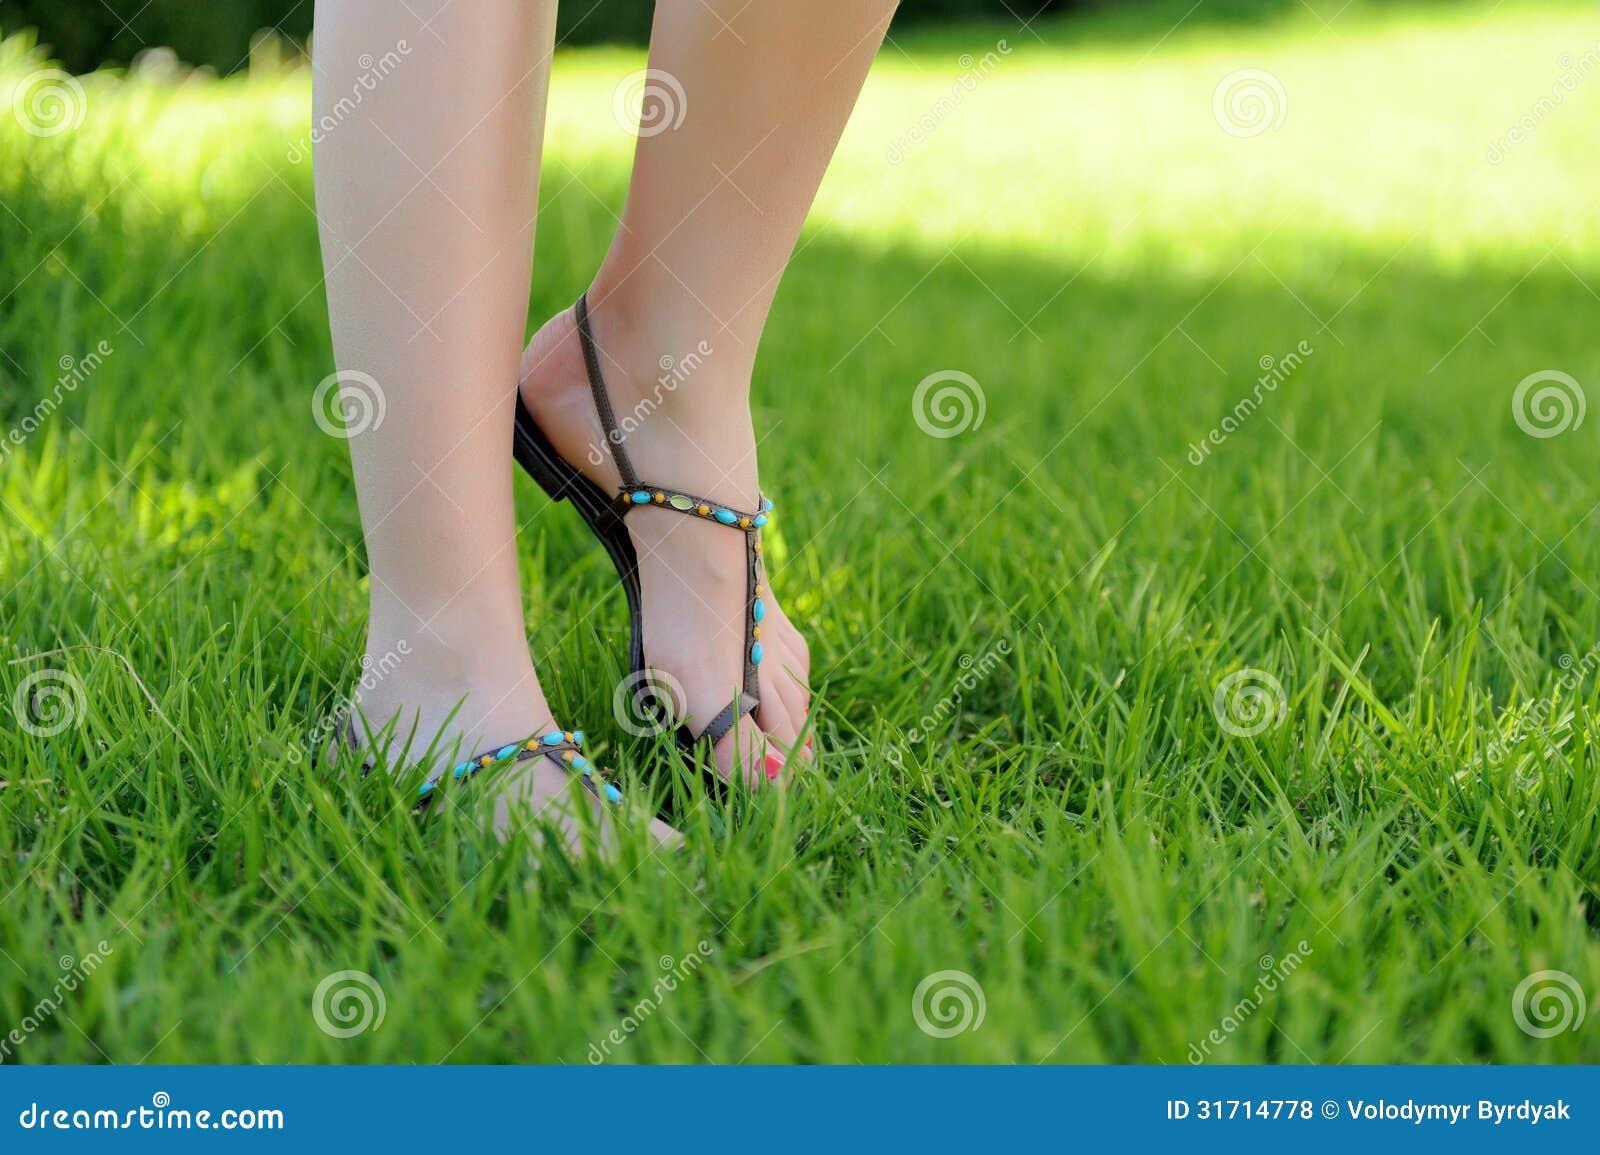 woman walking in grass - photo #4